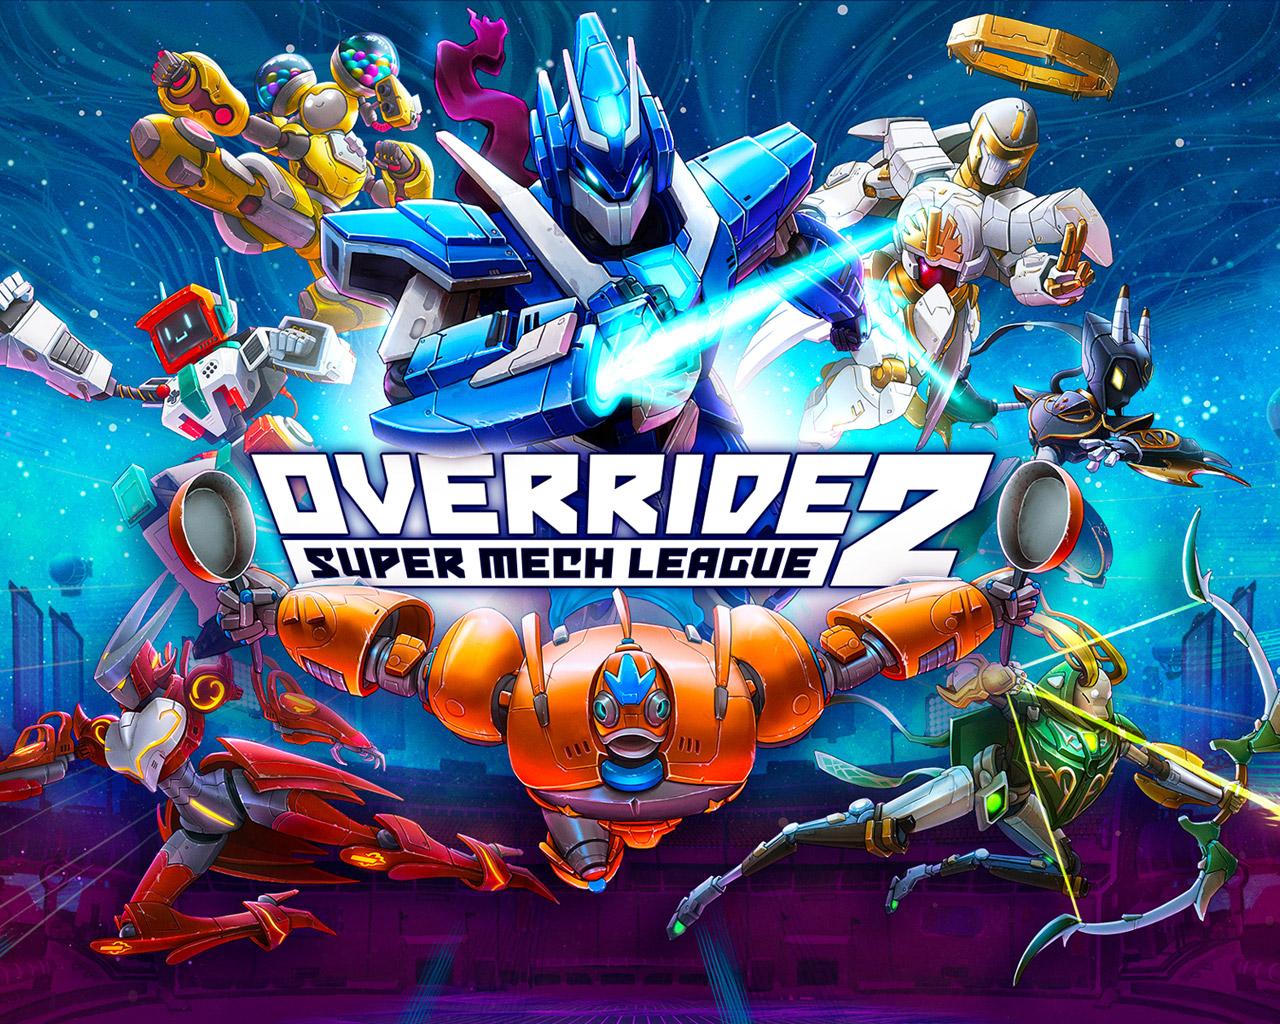 Override 2: Super Mech League Wallpaper in 1280x1024